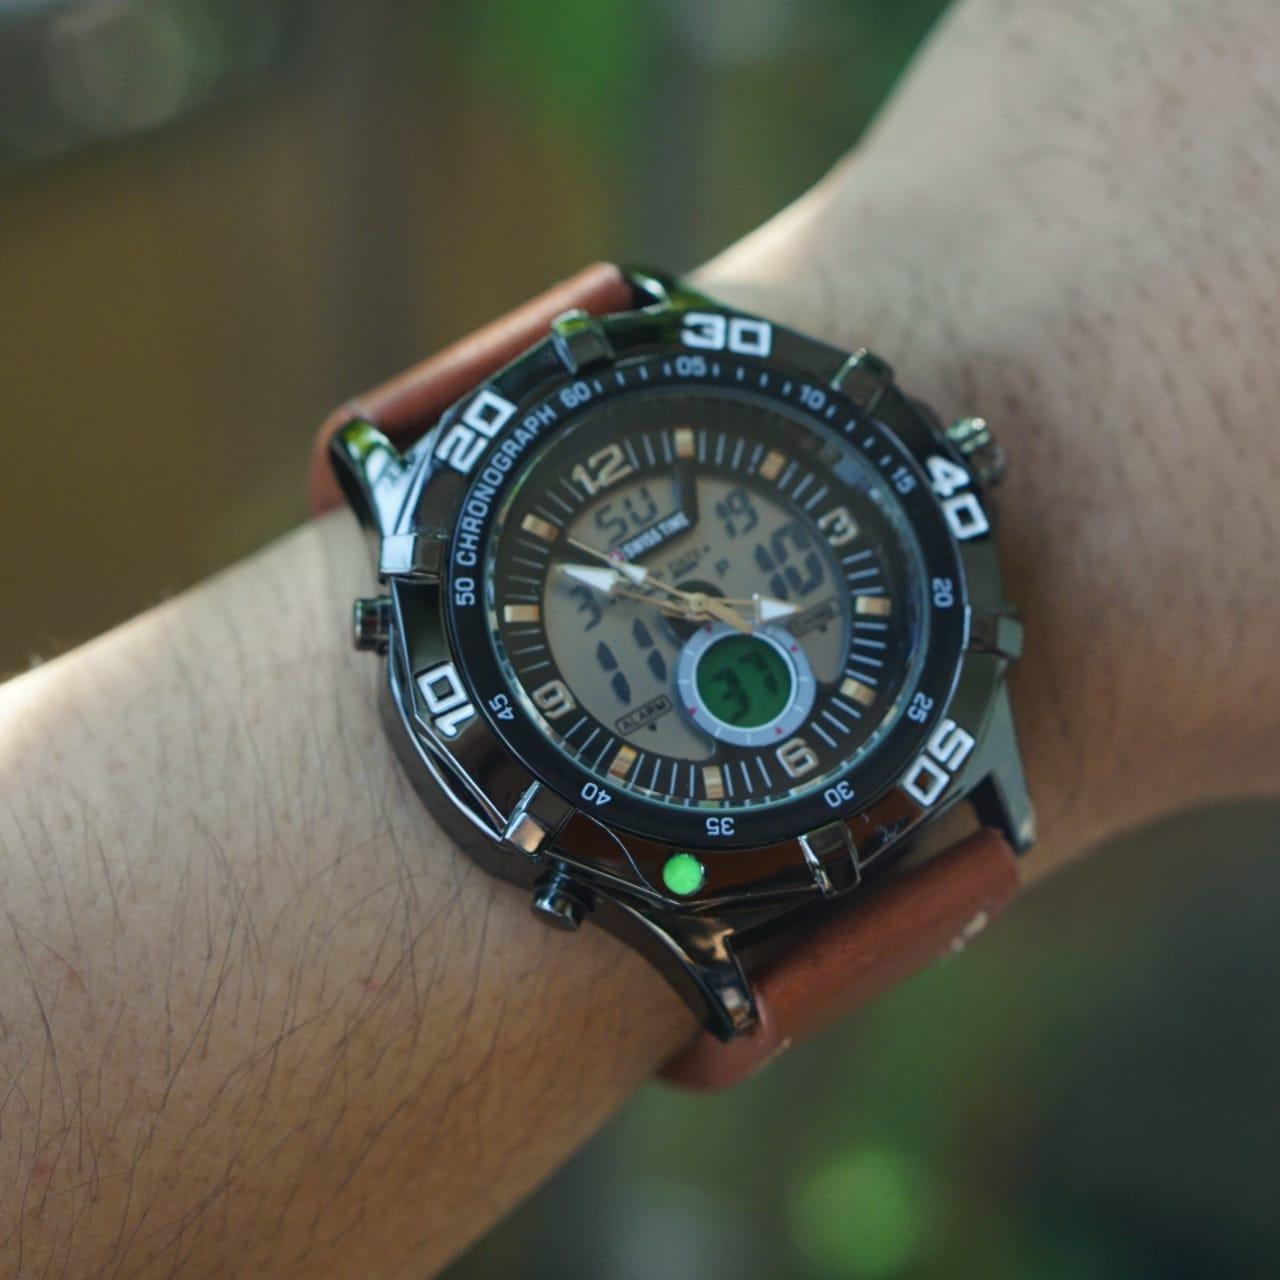 Swiss time - Dual Time- Jam Tangan Pria - tali kulit ST14213 - Grosir Jam Tangan Indonesia